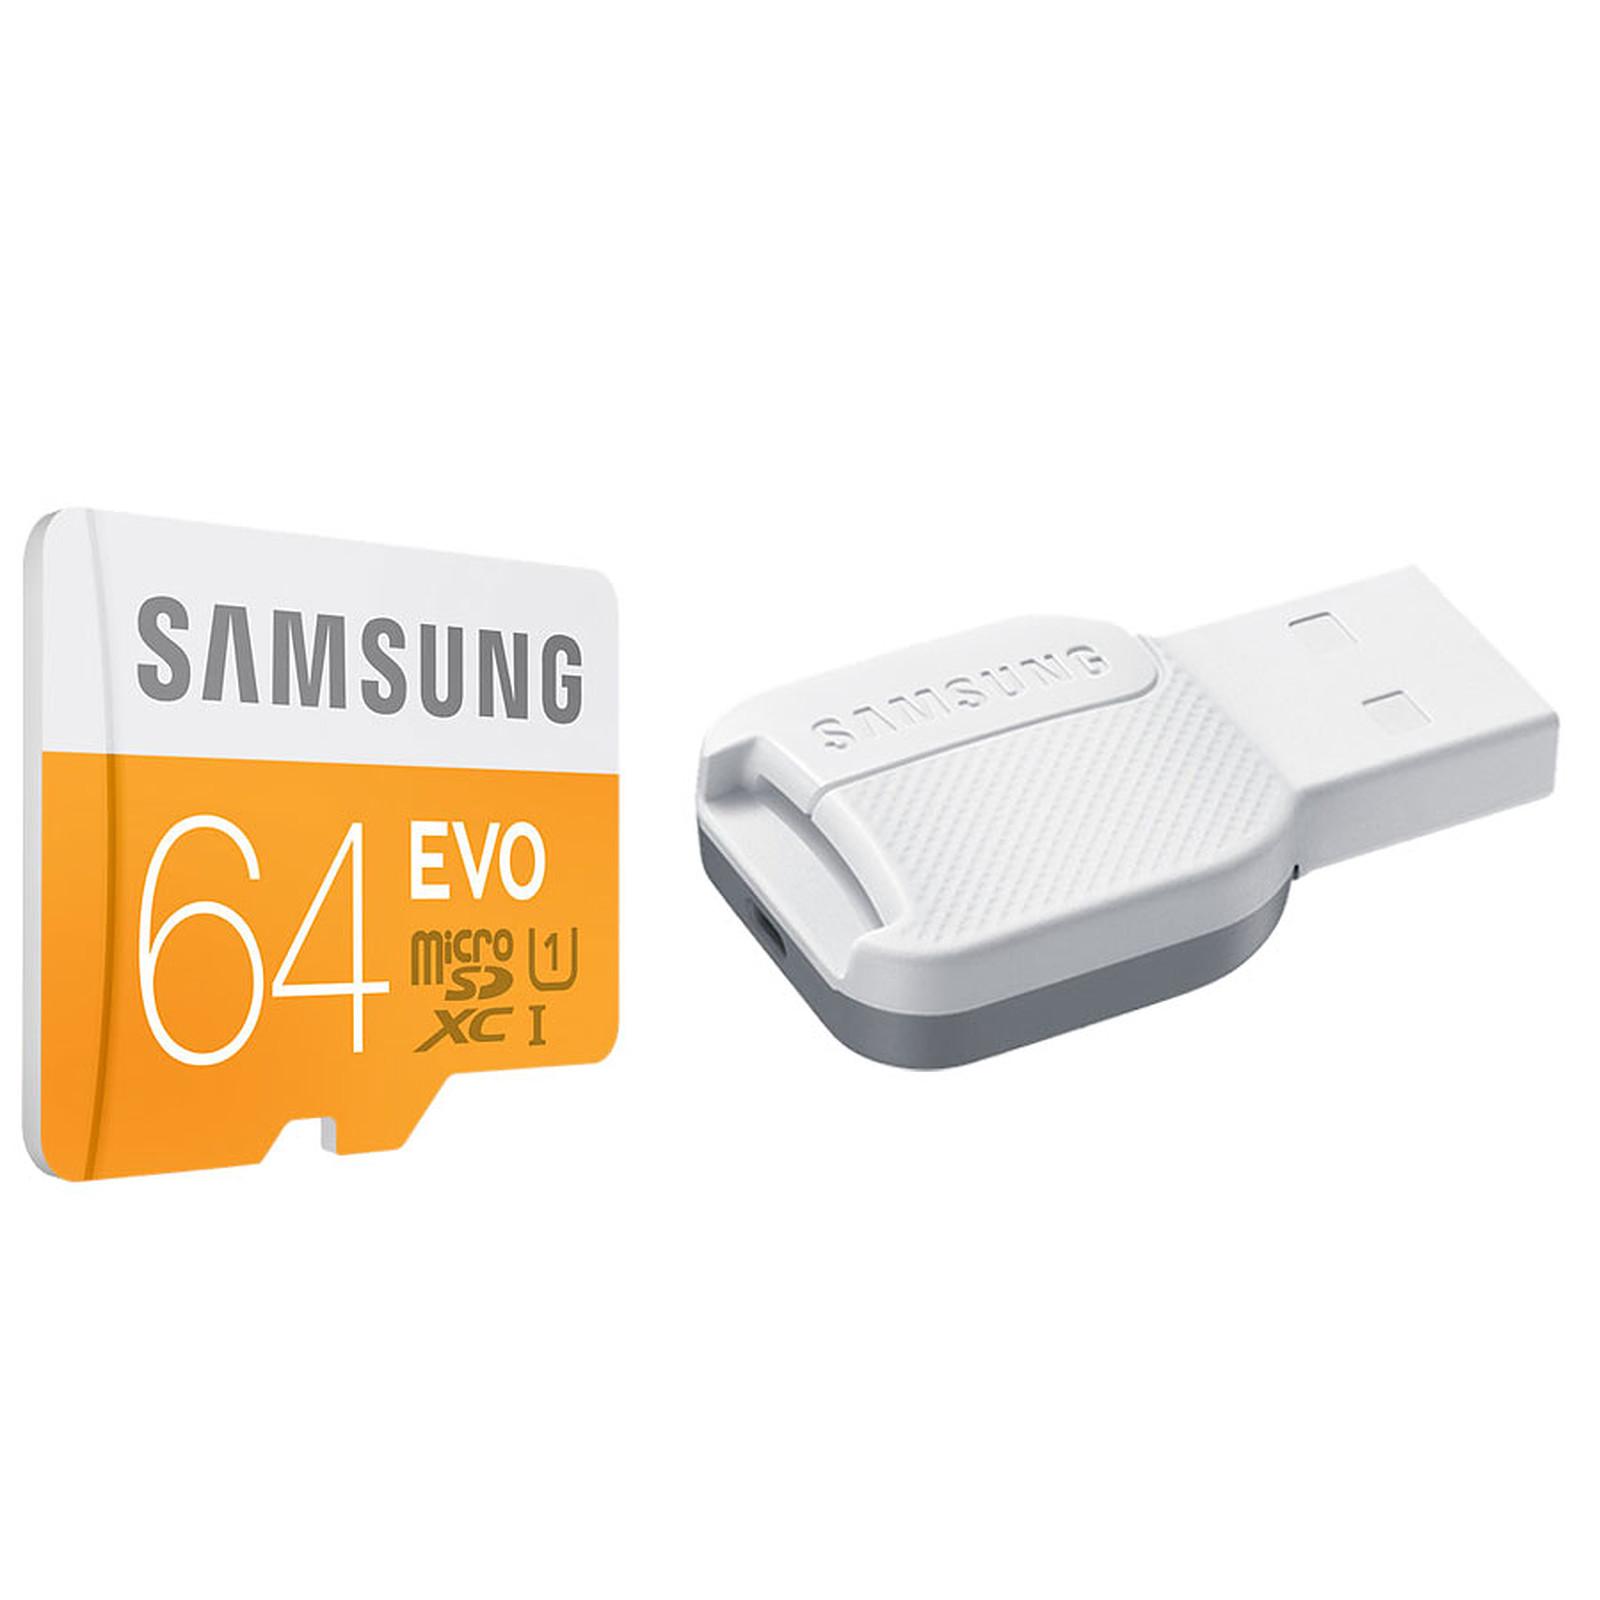 Samsung EVO microSDXC 64 Go + adaptateur USB